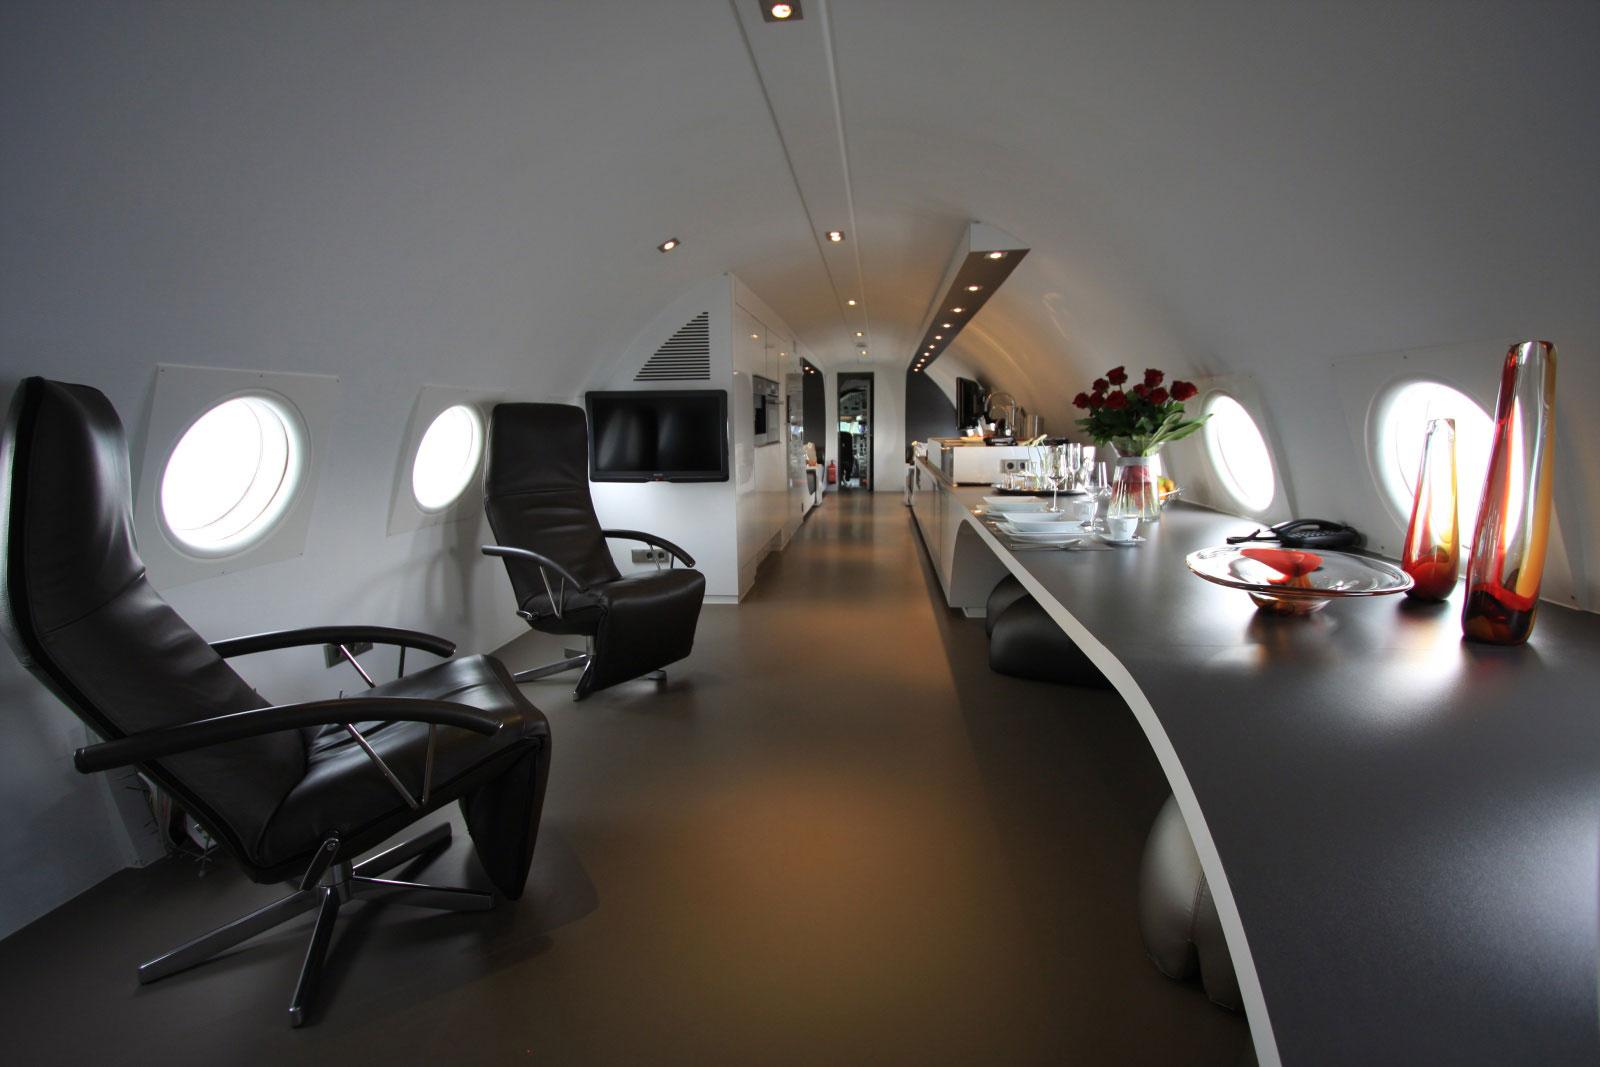 airplane-Suite-ddr-honnecker-il18-raum-2